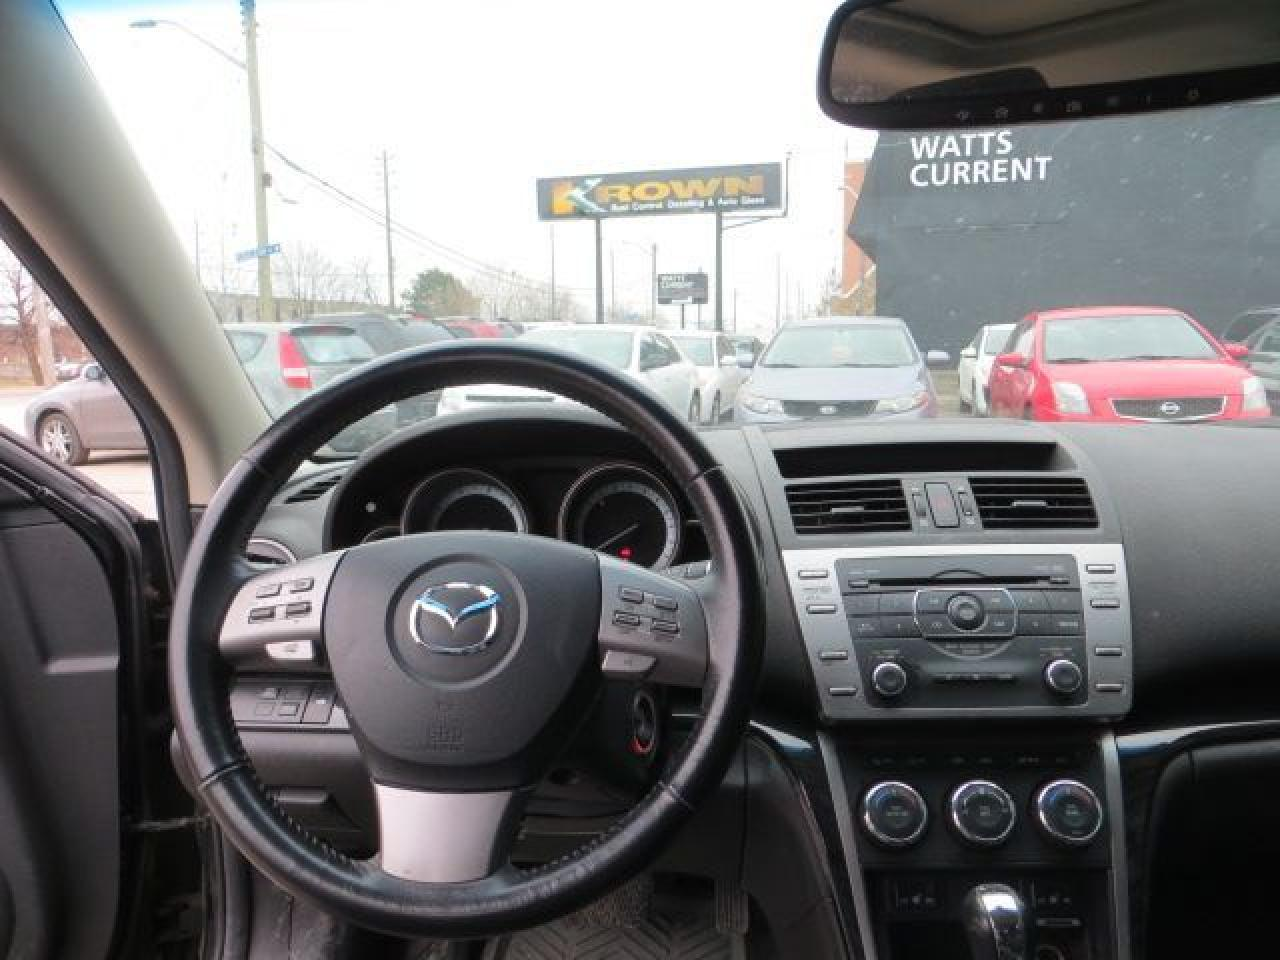 2010 Mazda MAZDA6 GT,LEATHER,SUNROOF,BLUETOOTH,ALLOYS,FOGS